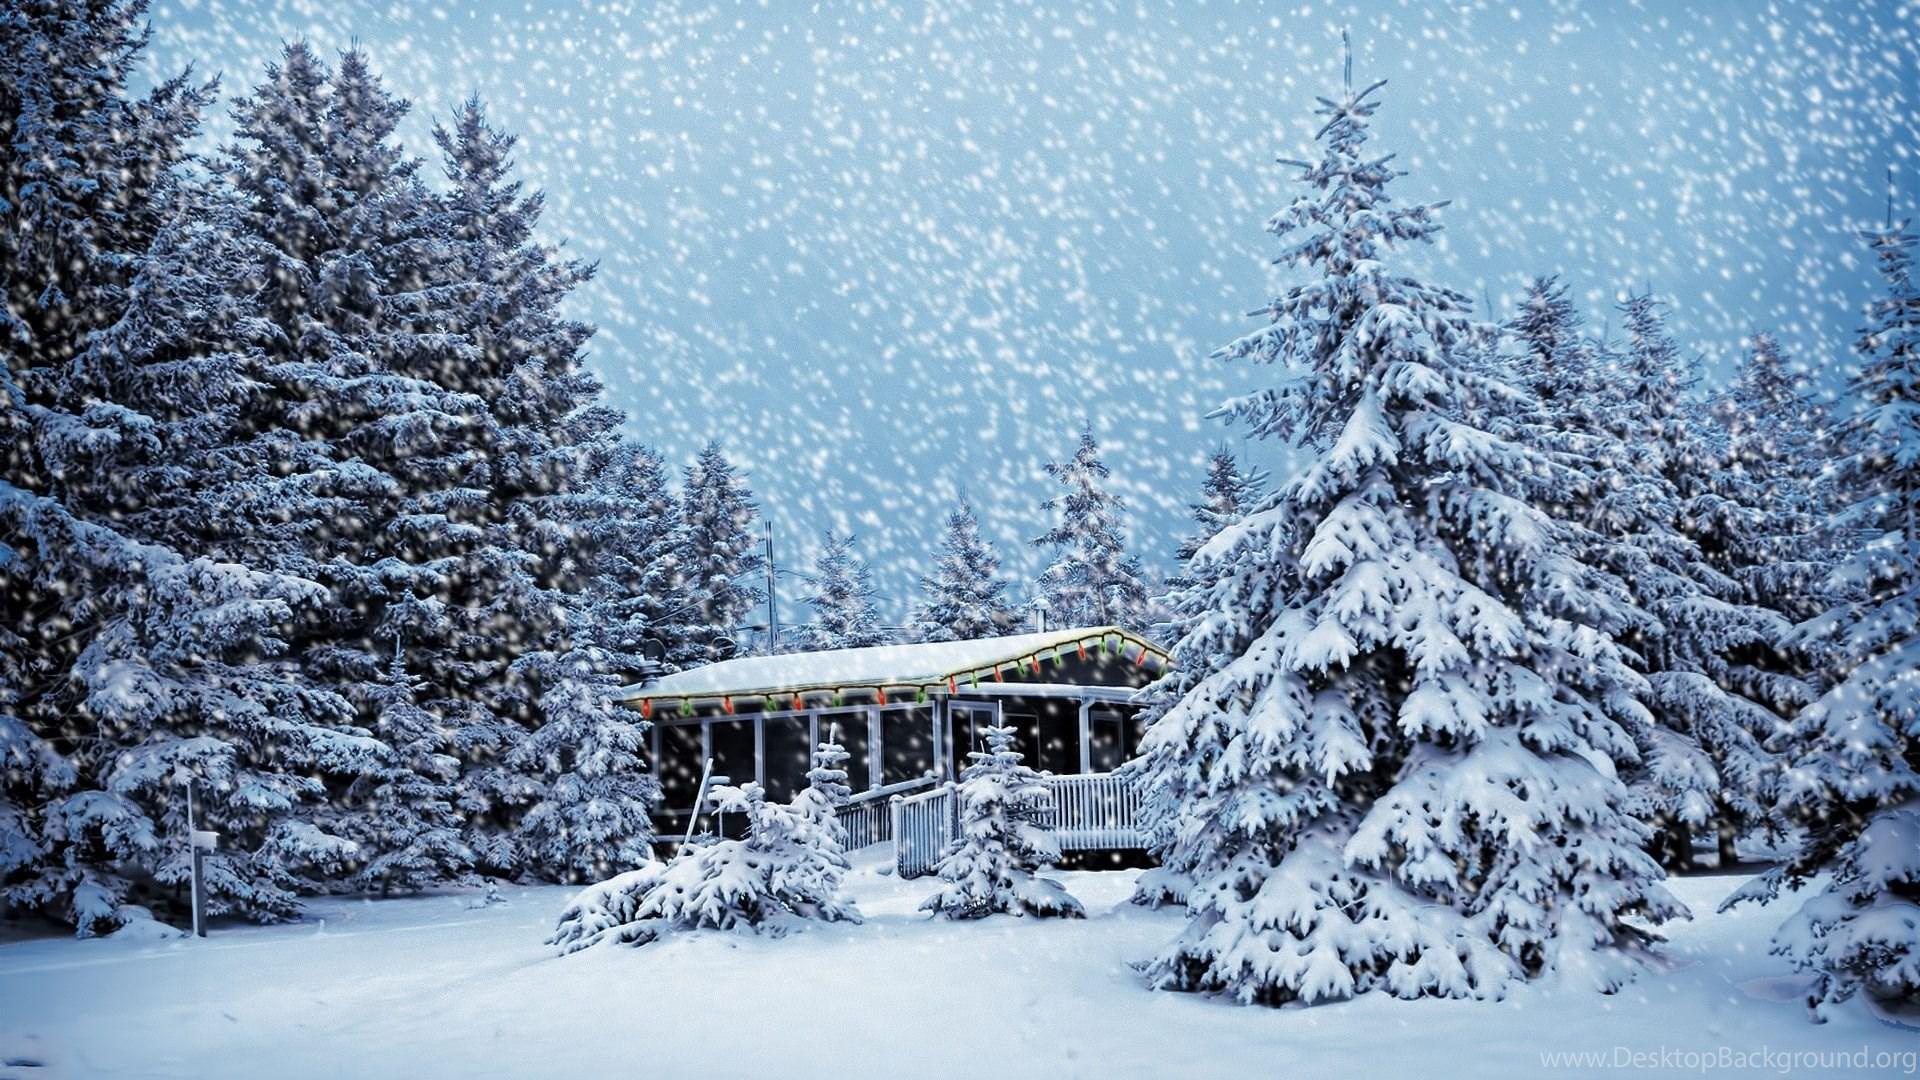 Top Full Hd 3d Christmas Images For Pinterest Desktop Background